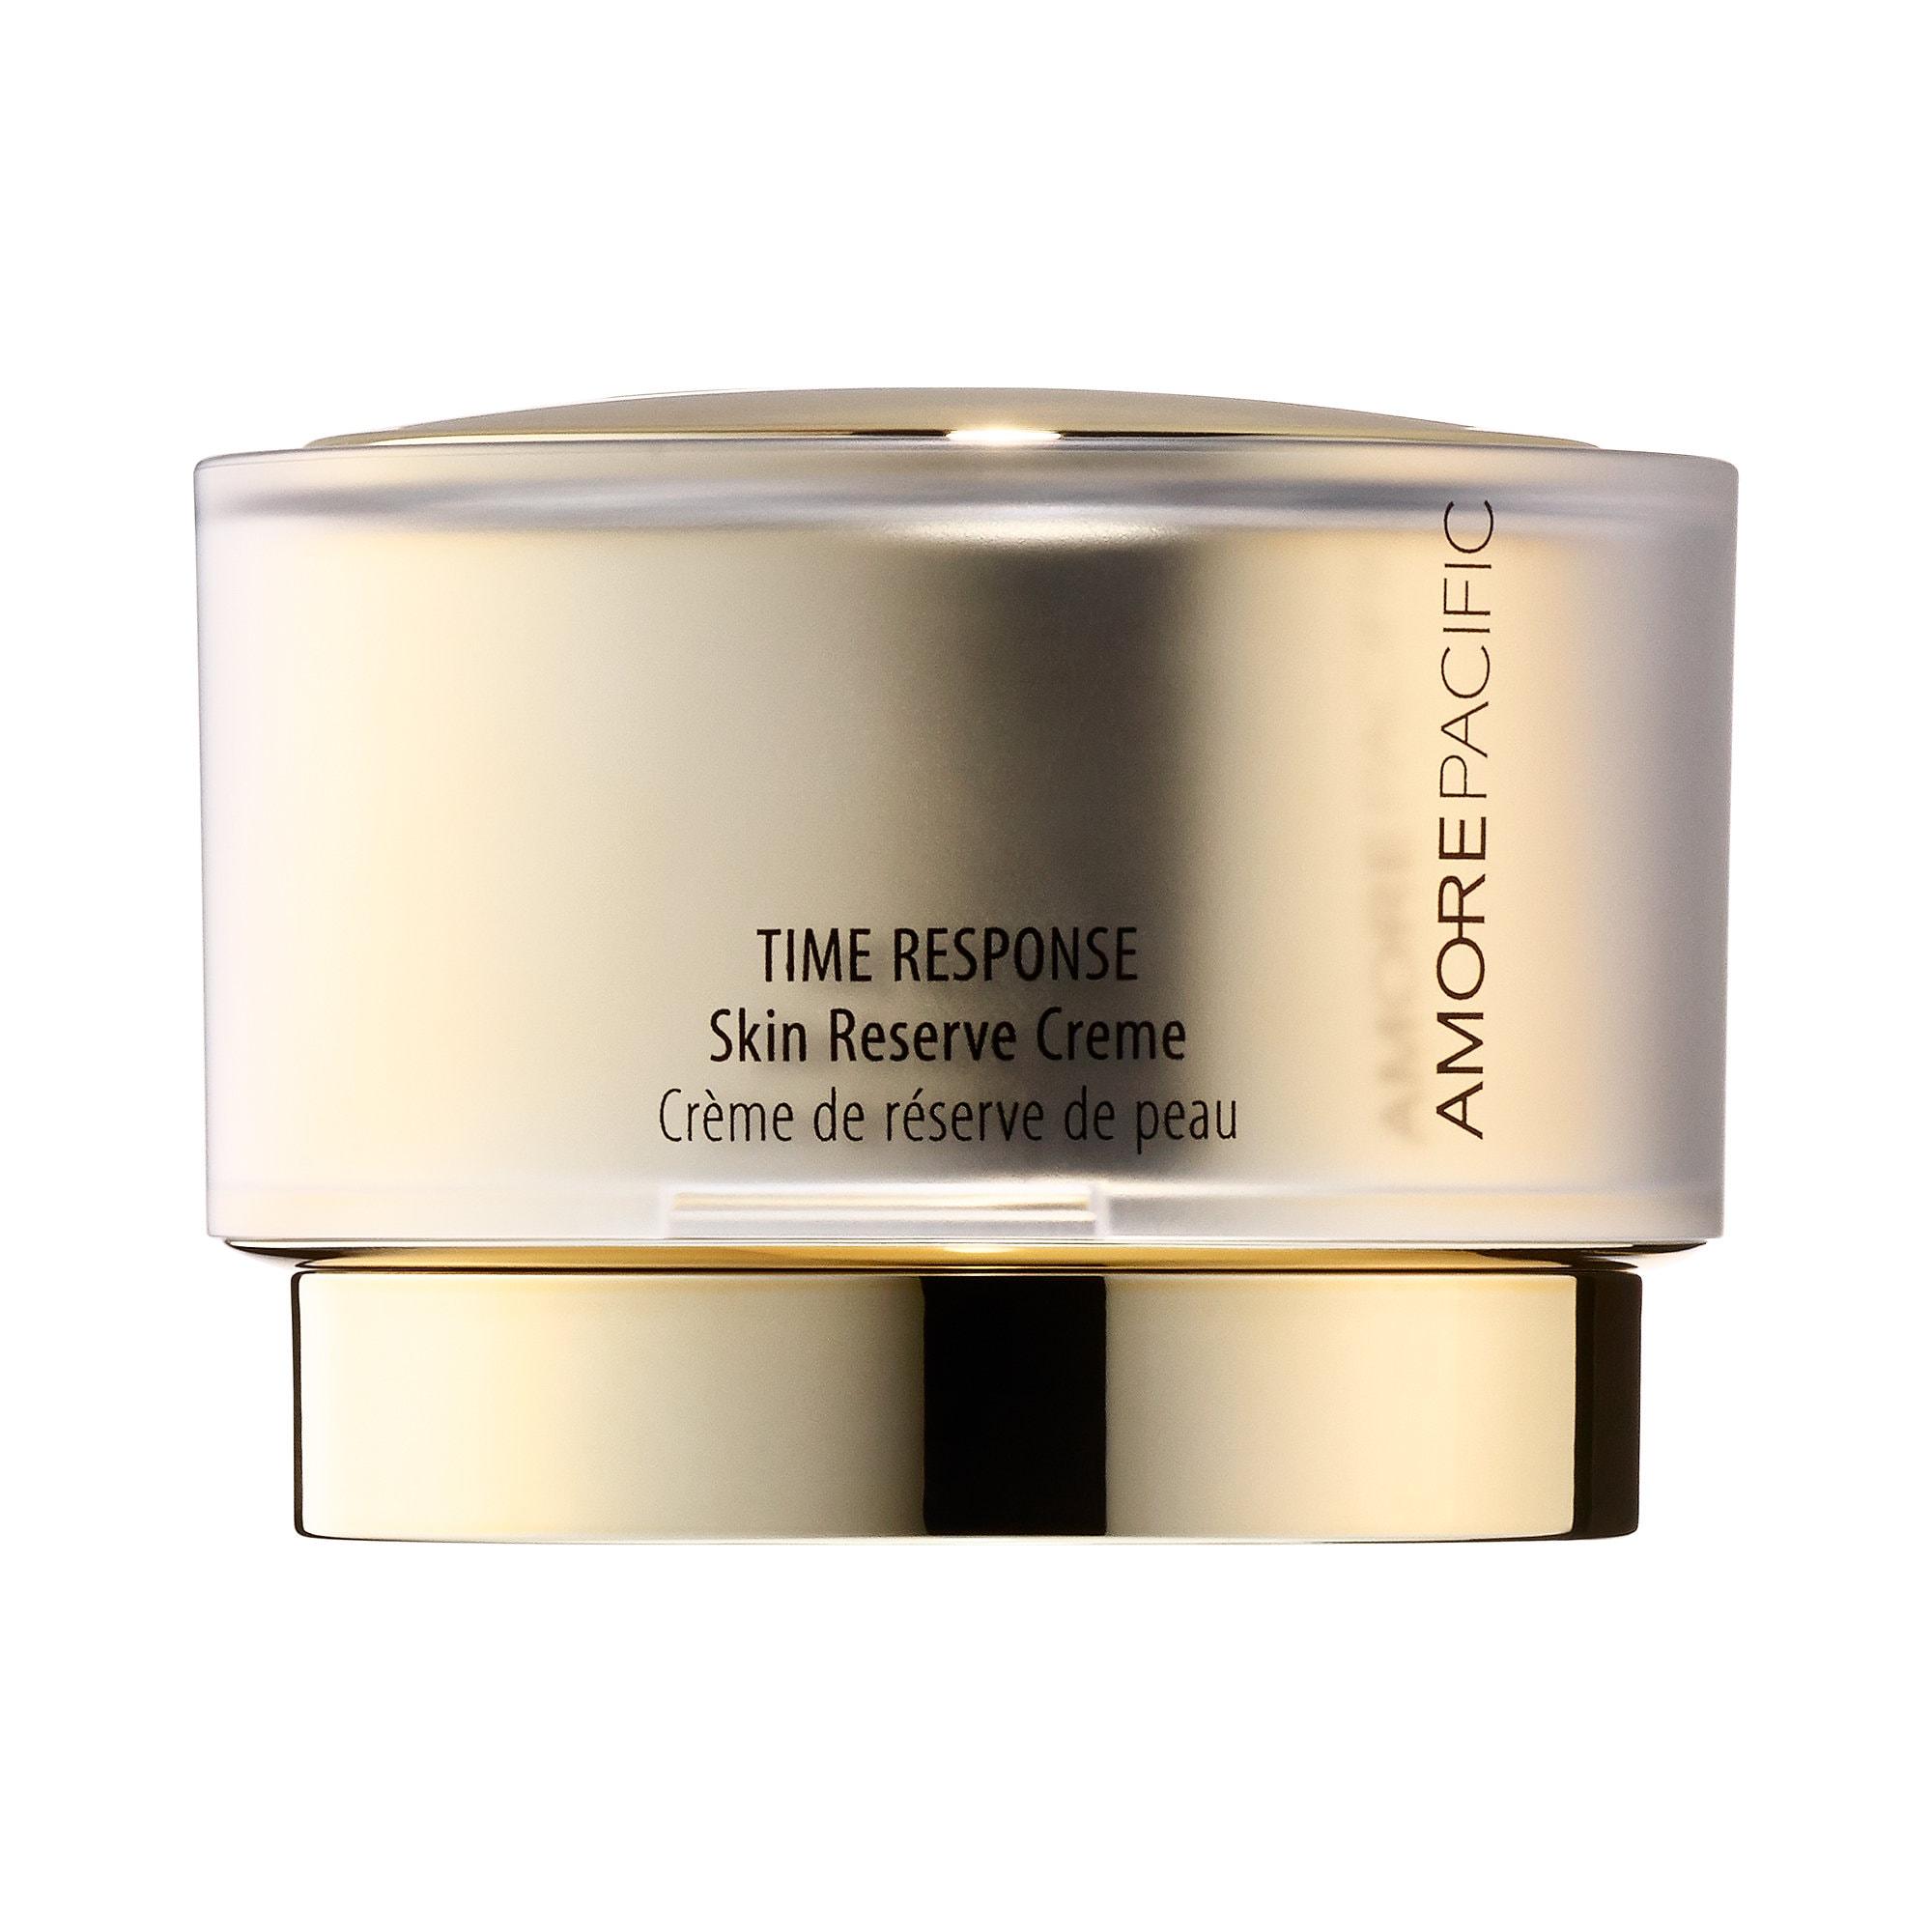 Amorepacific - TIME RESPONSE Skin Reserve Crème